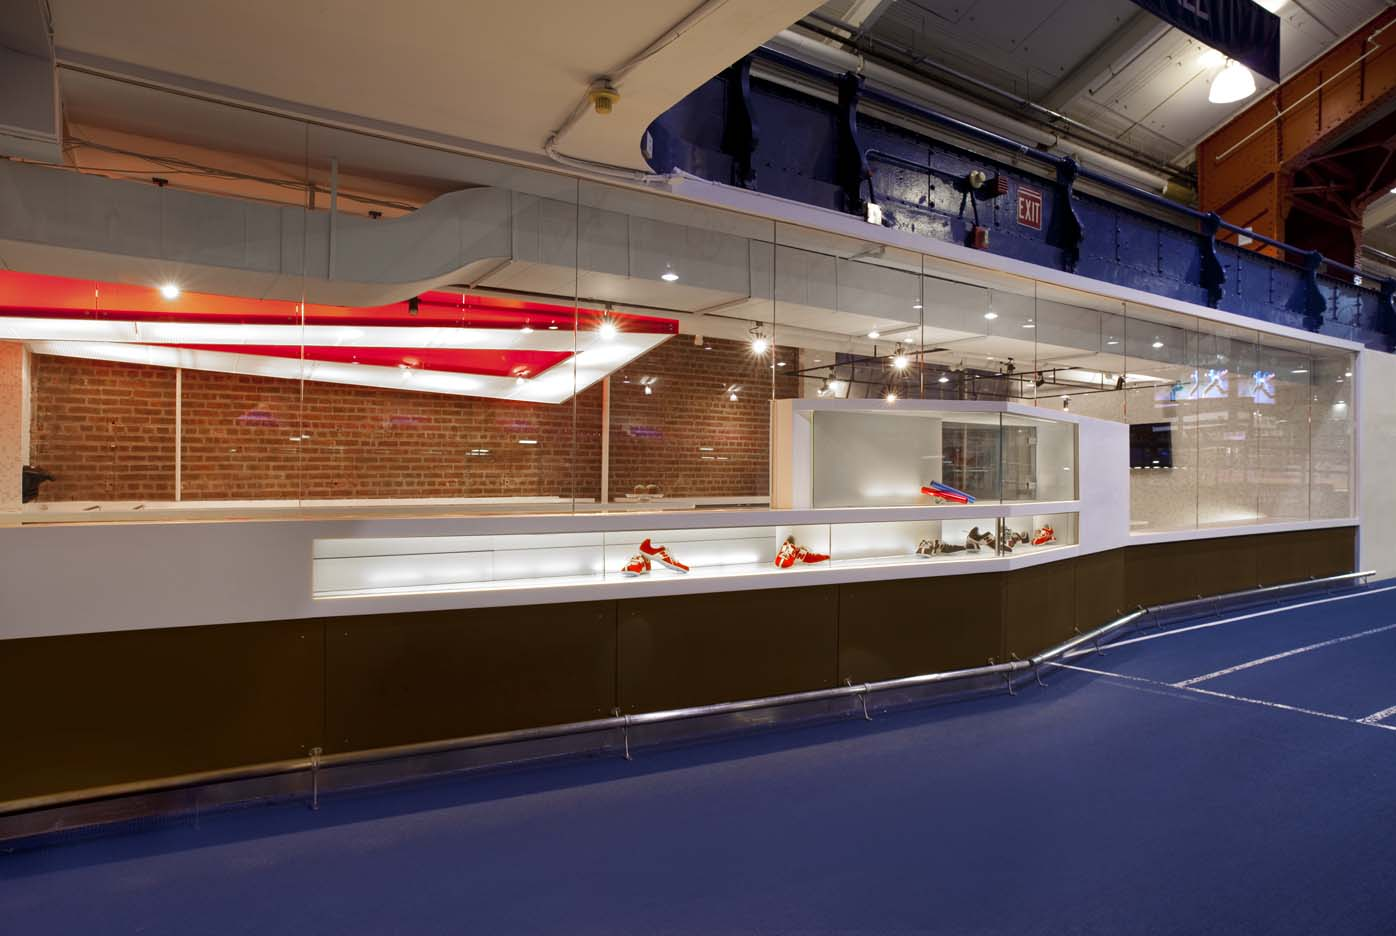 DesignLaboratories-Cafe & Bathrooms 0544.jpg